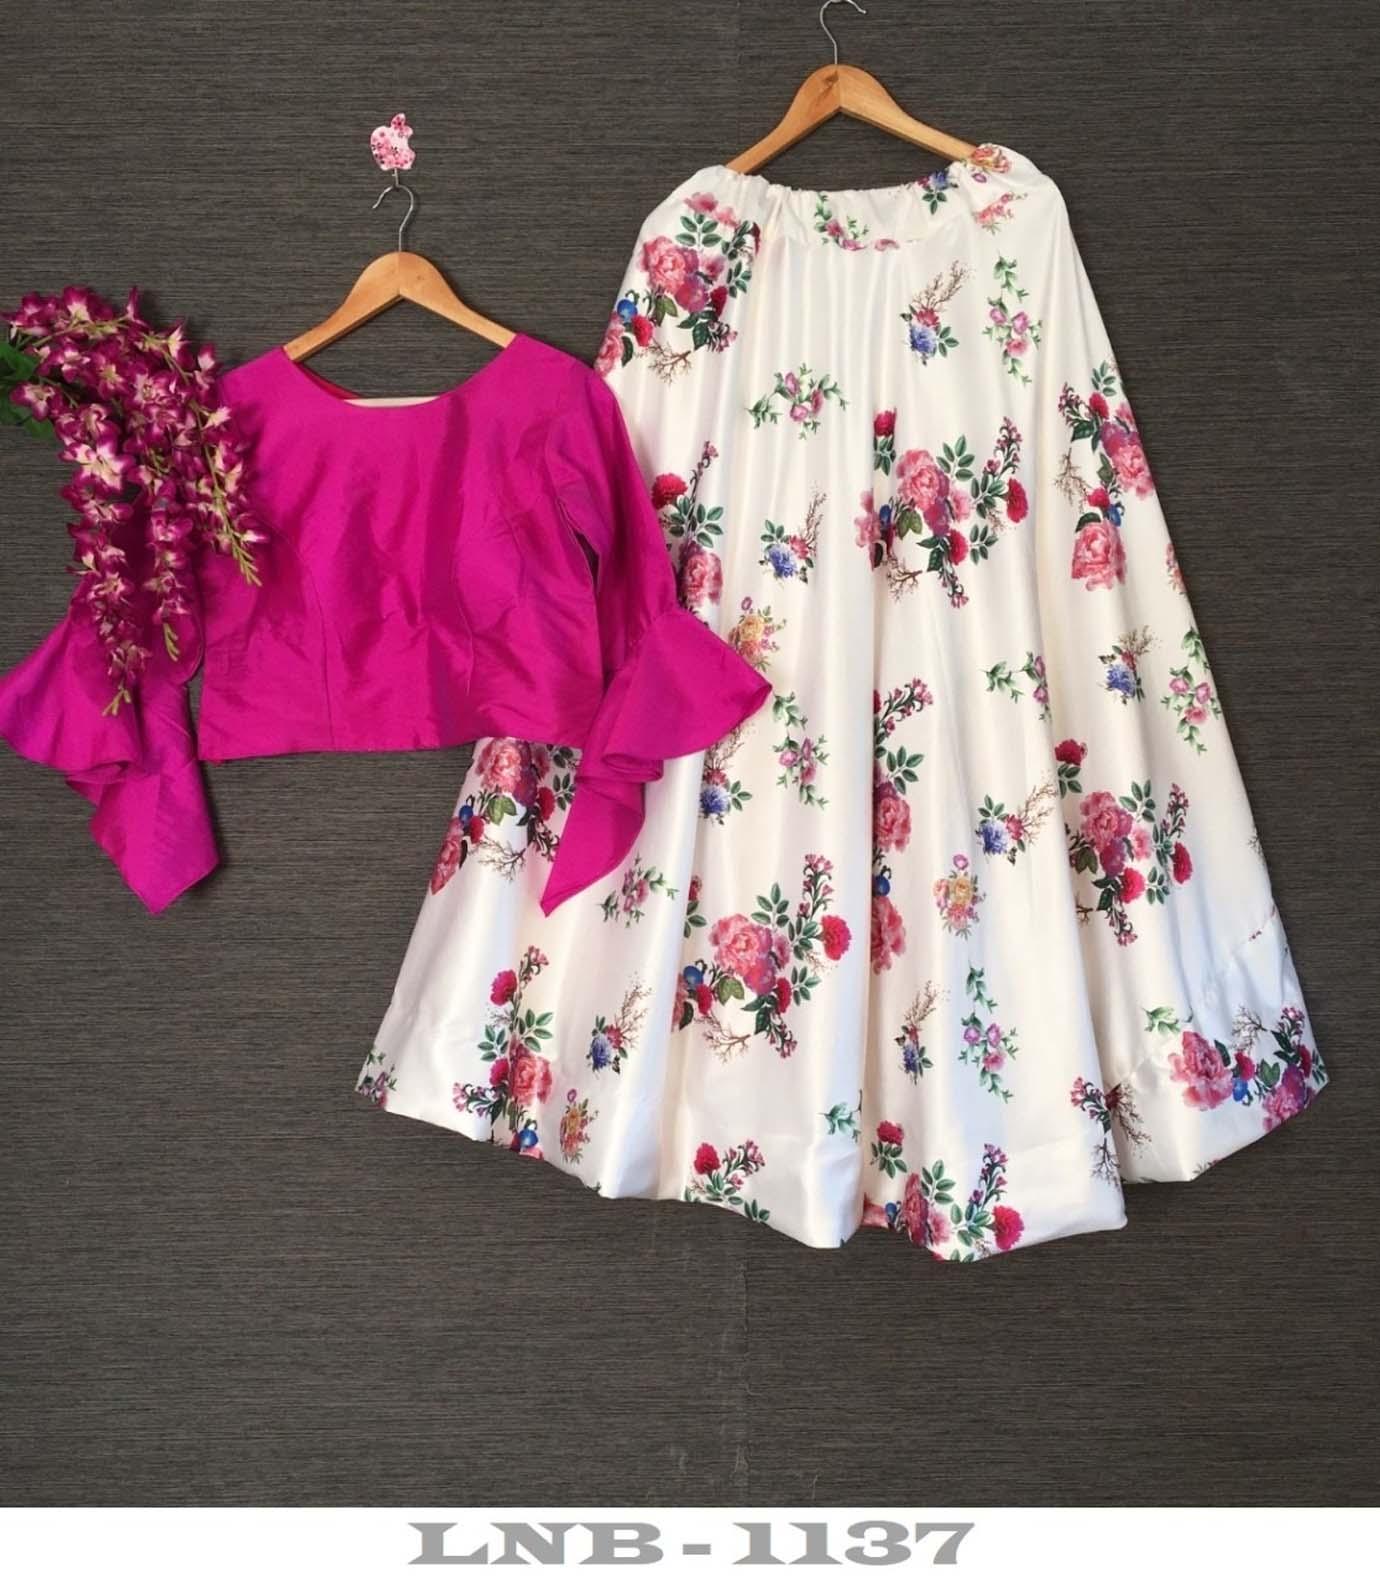 New Round Neck Dress For Women